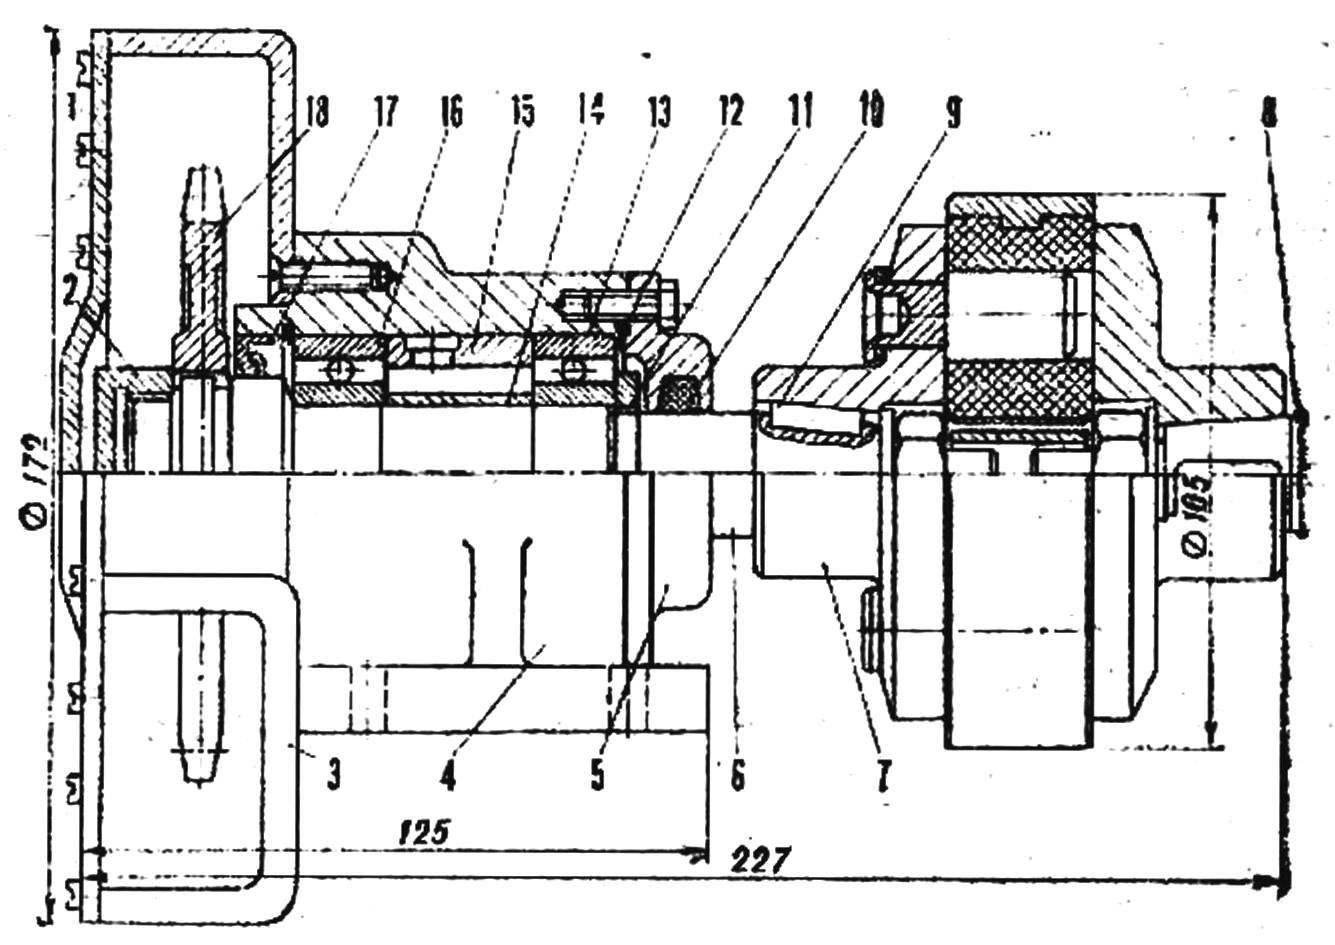 Fig. 4. Clutch shaft and sprocket